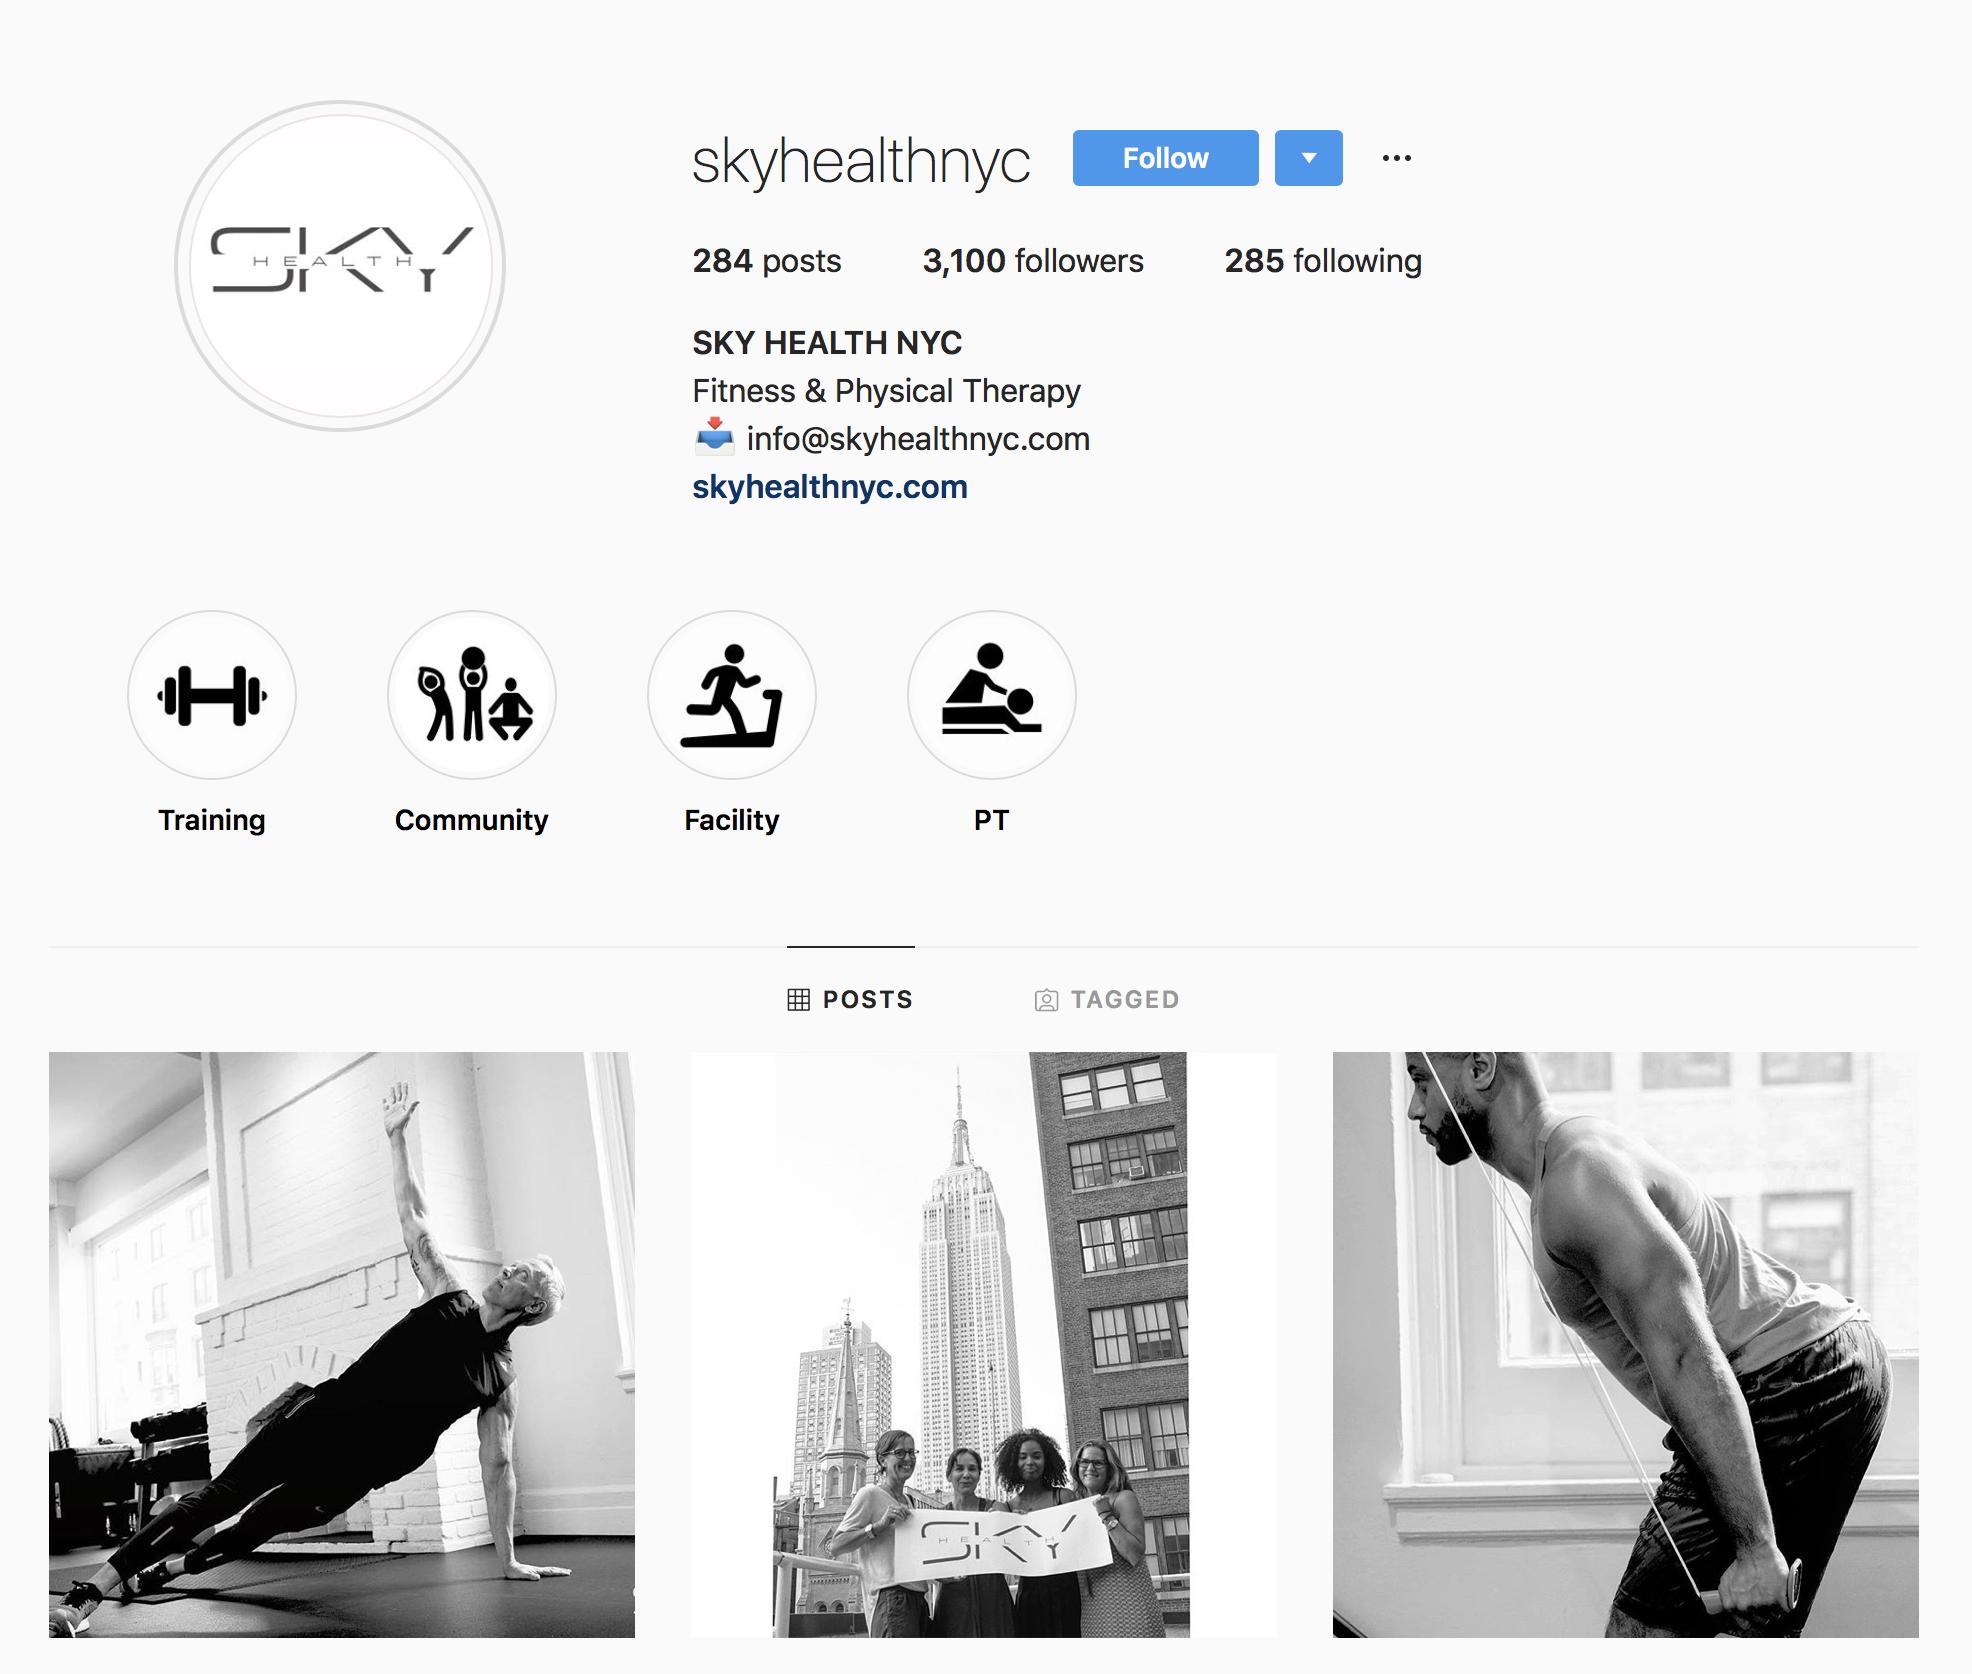 Sky Health NYC Instagram Page